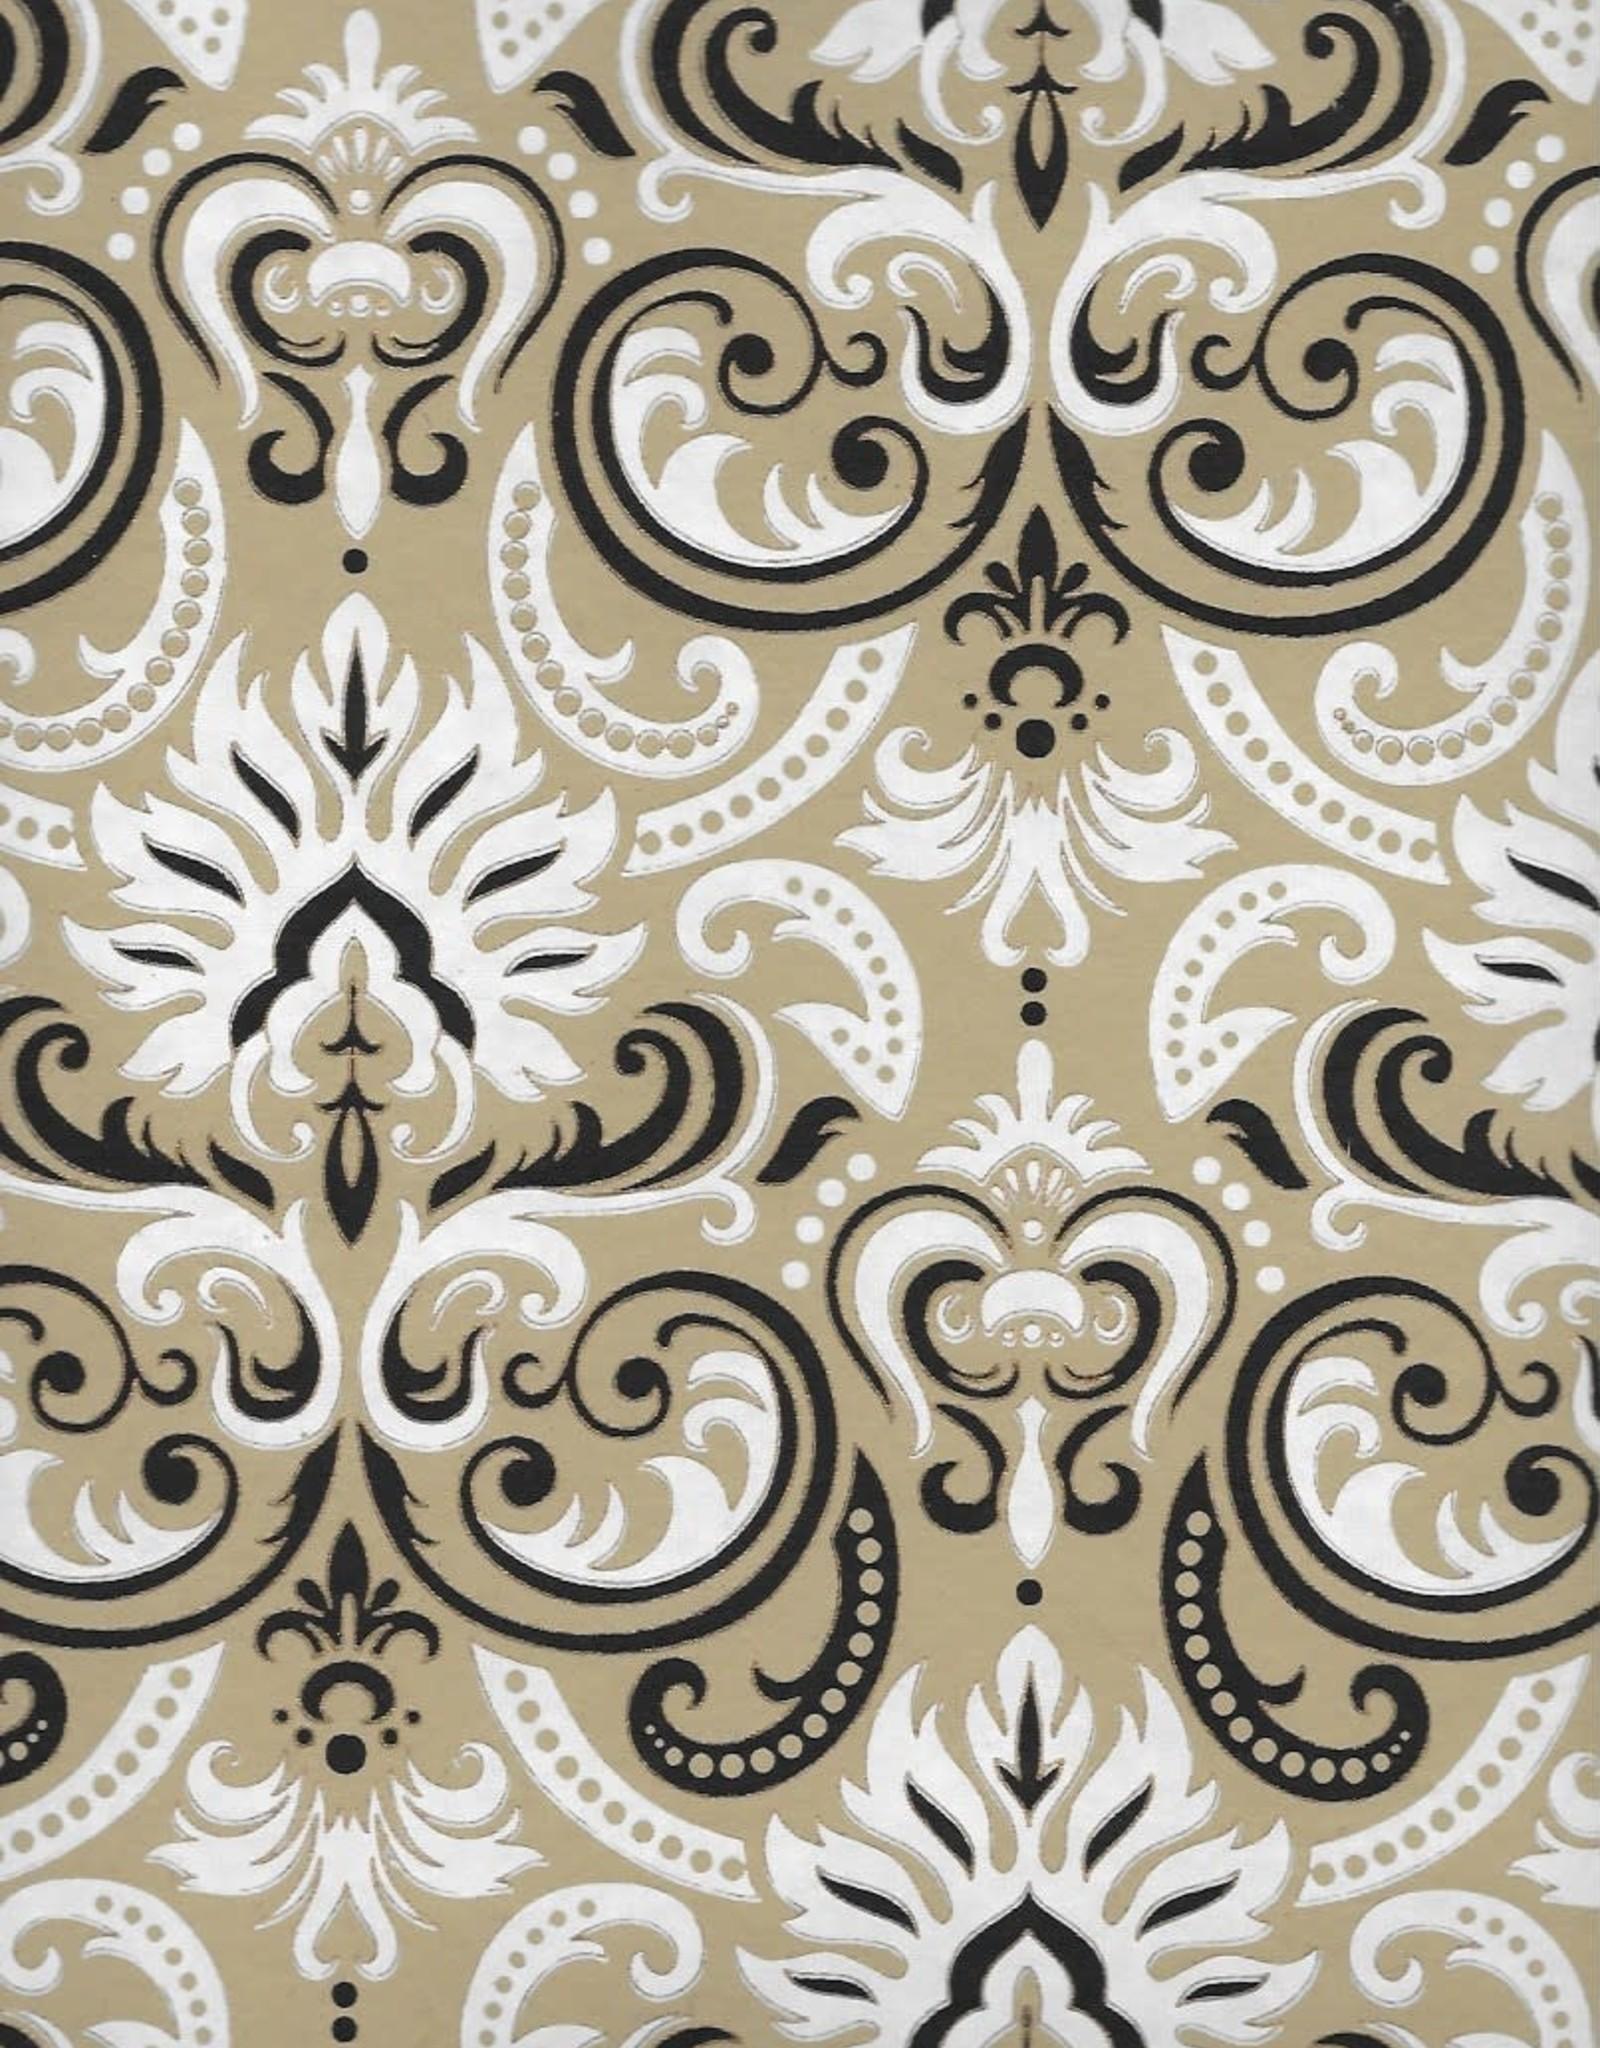 "White Fire Ornate Swirls, White, Black, Gold on Light Brown, 22"" x 30"""